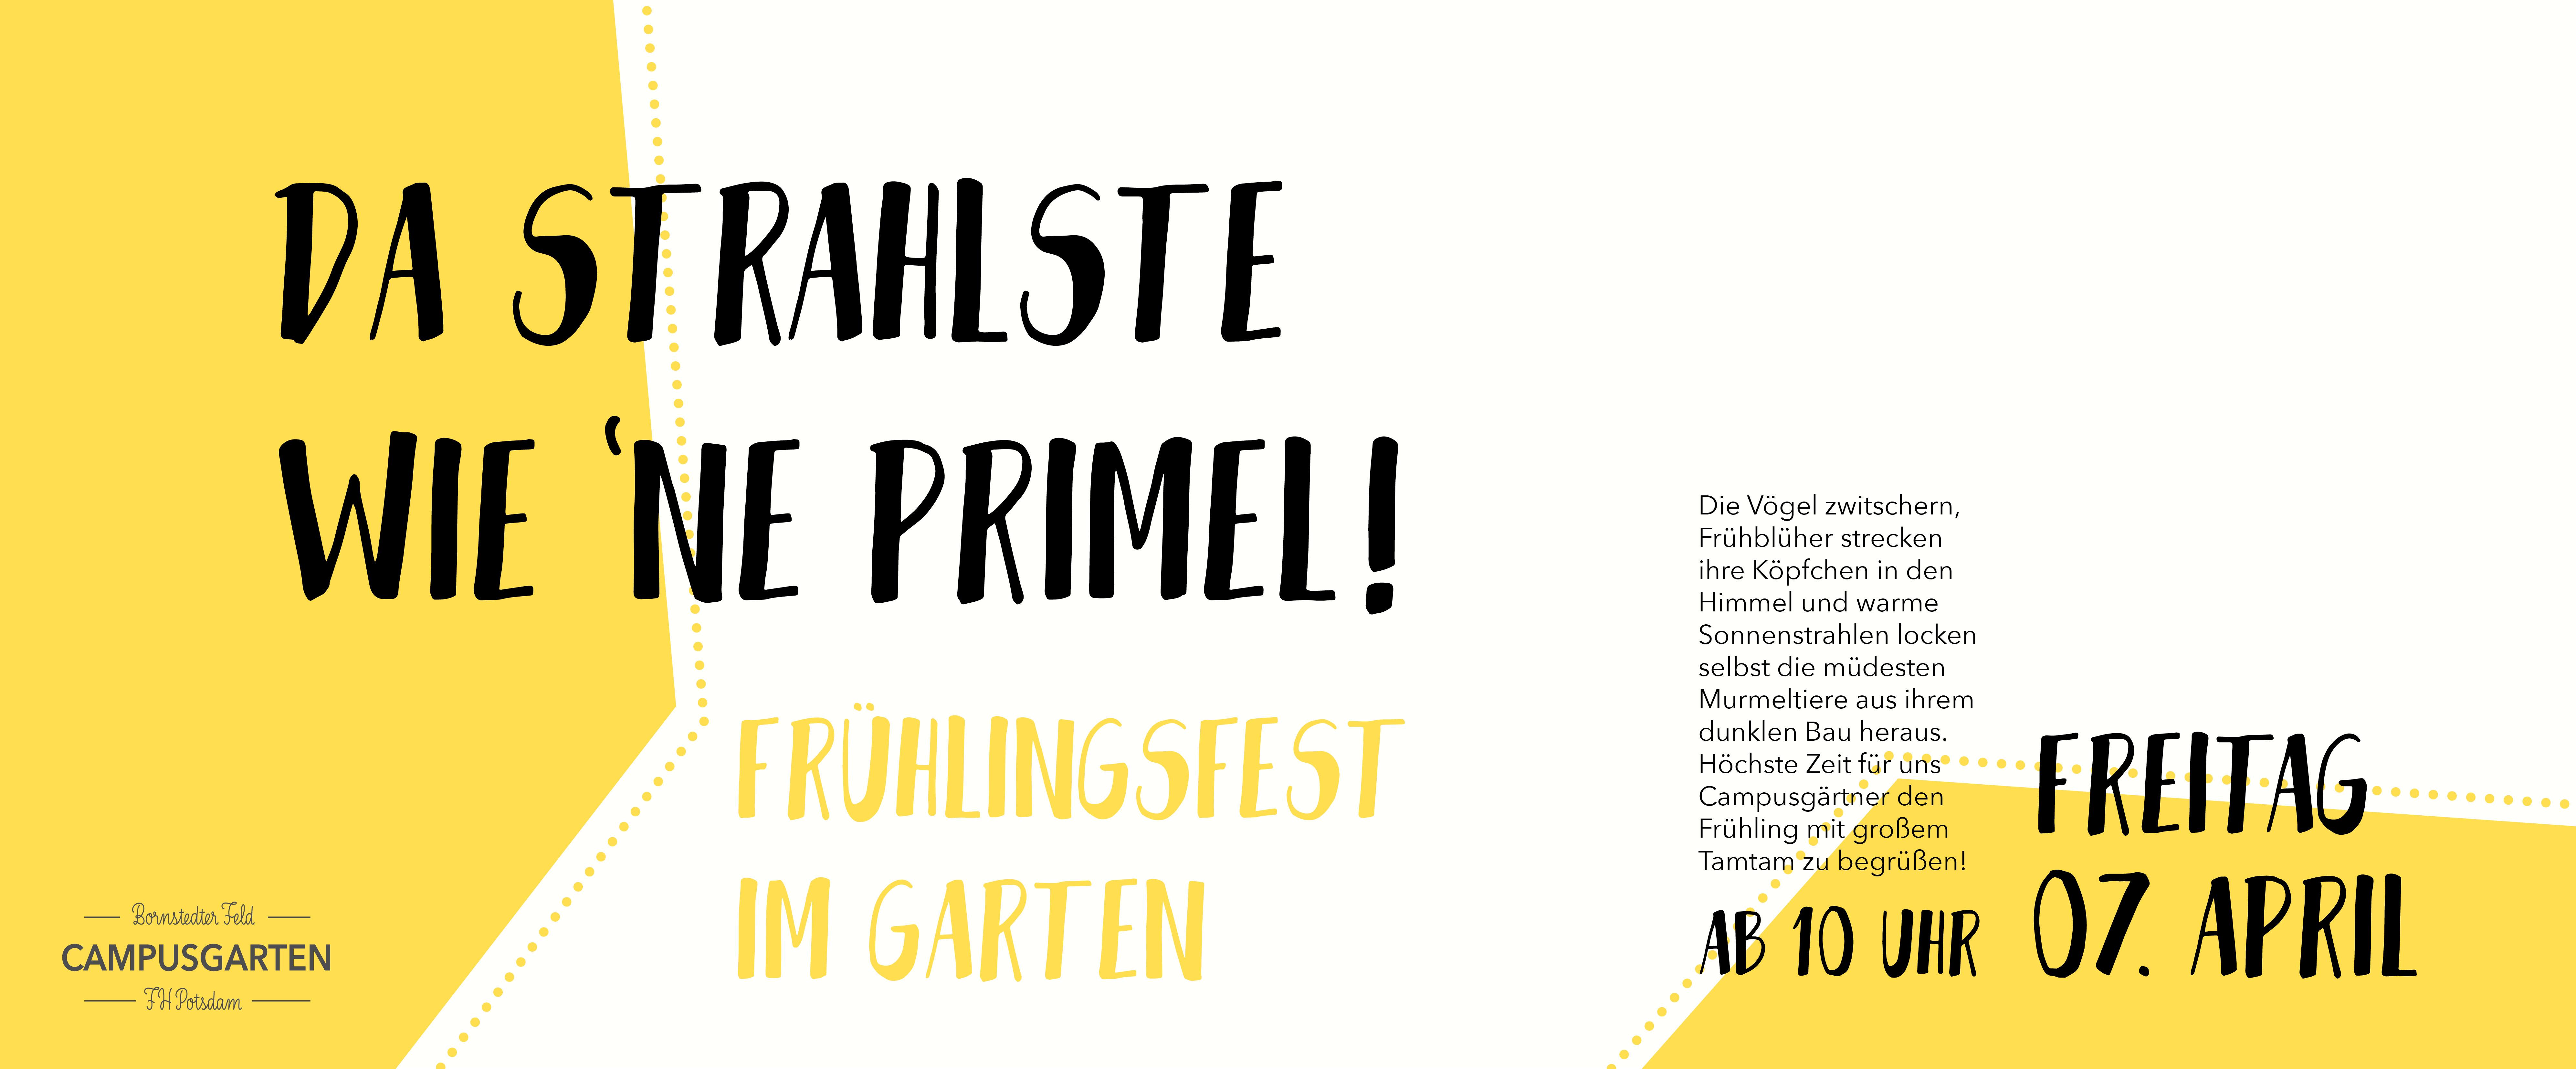 Frühlingsfest-Plakat